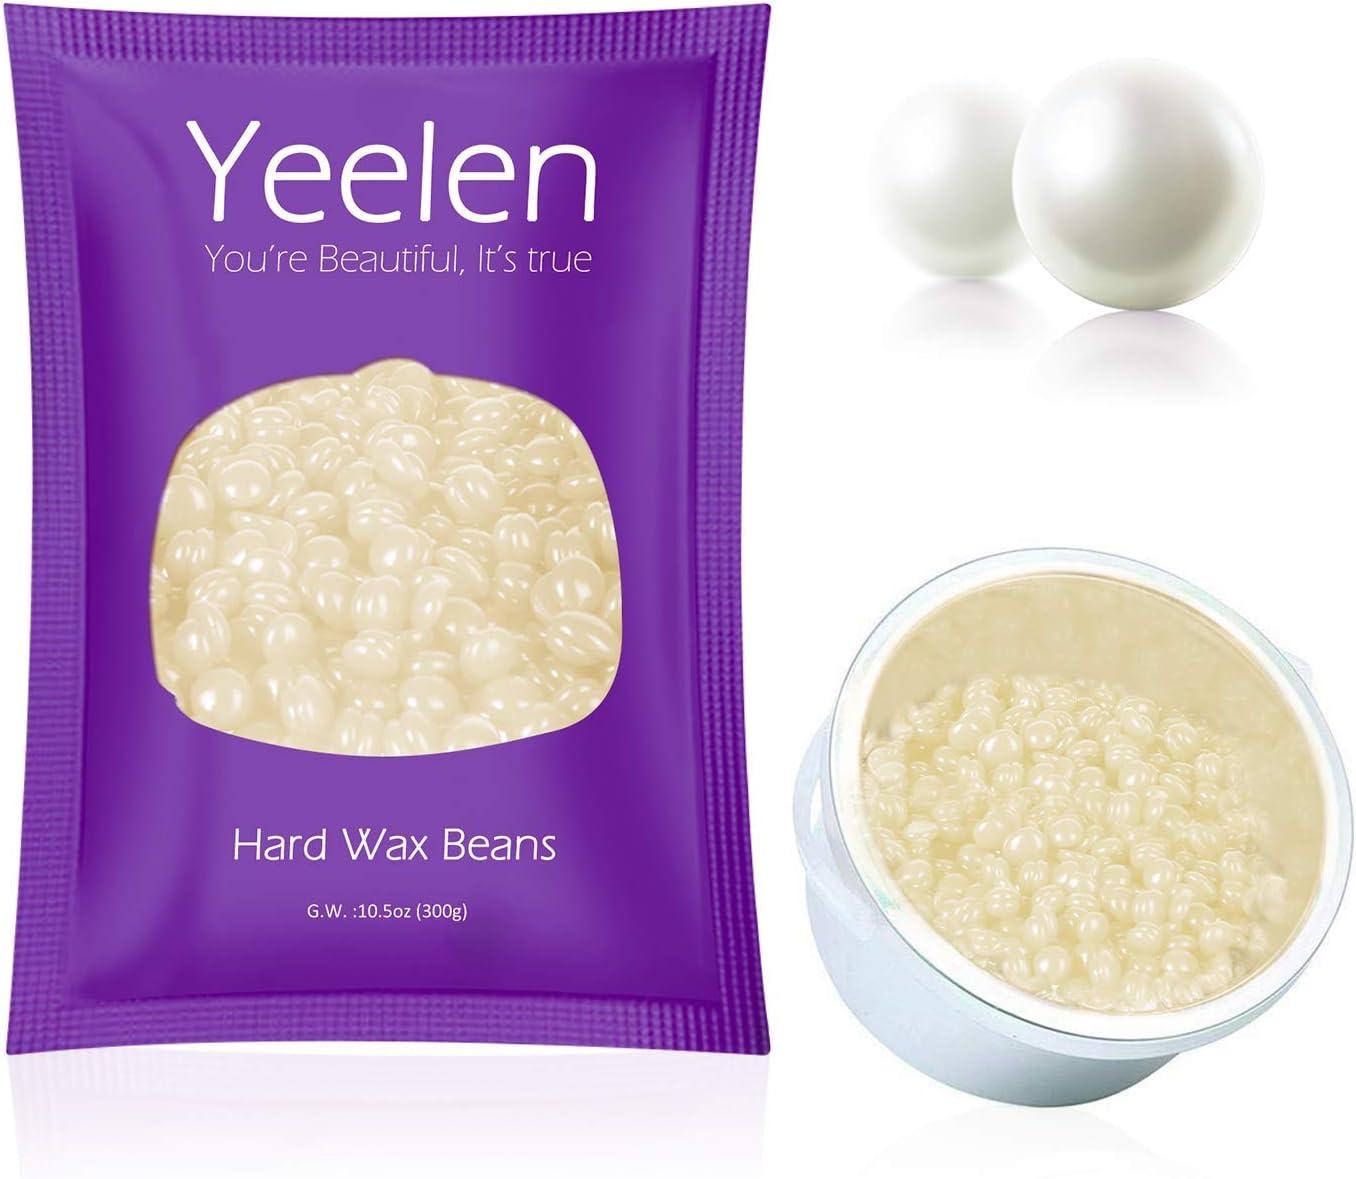 Yeelen Wax Bean Painless Hair Removal for Women Men for Facial Arm Legs Pearl Wax Beans (300g)